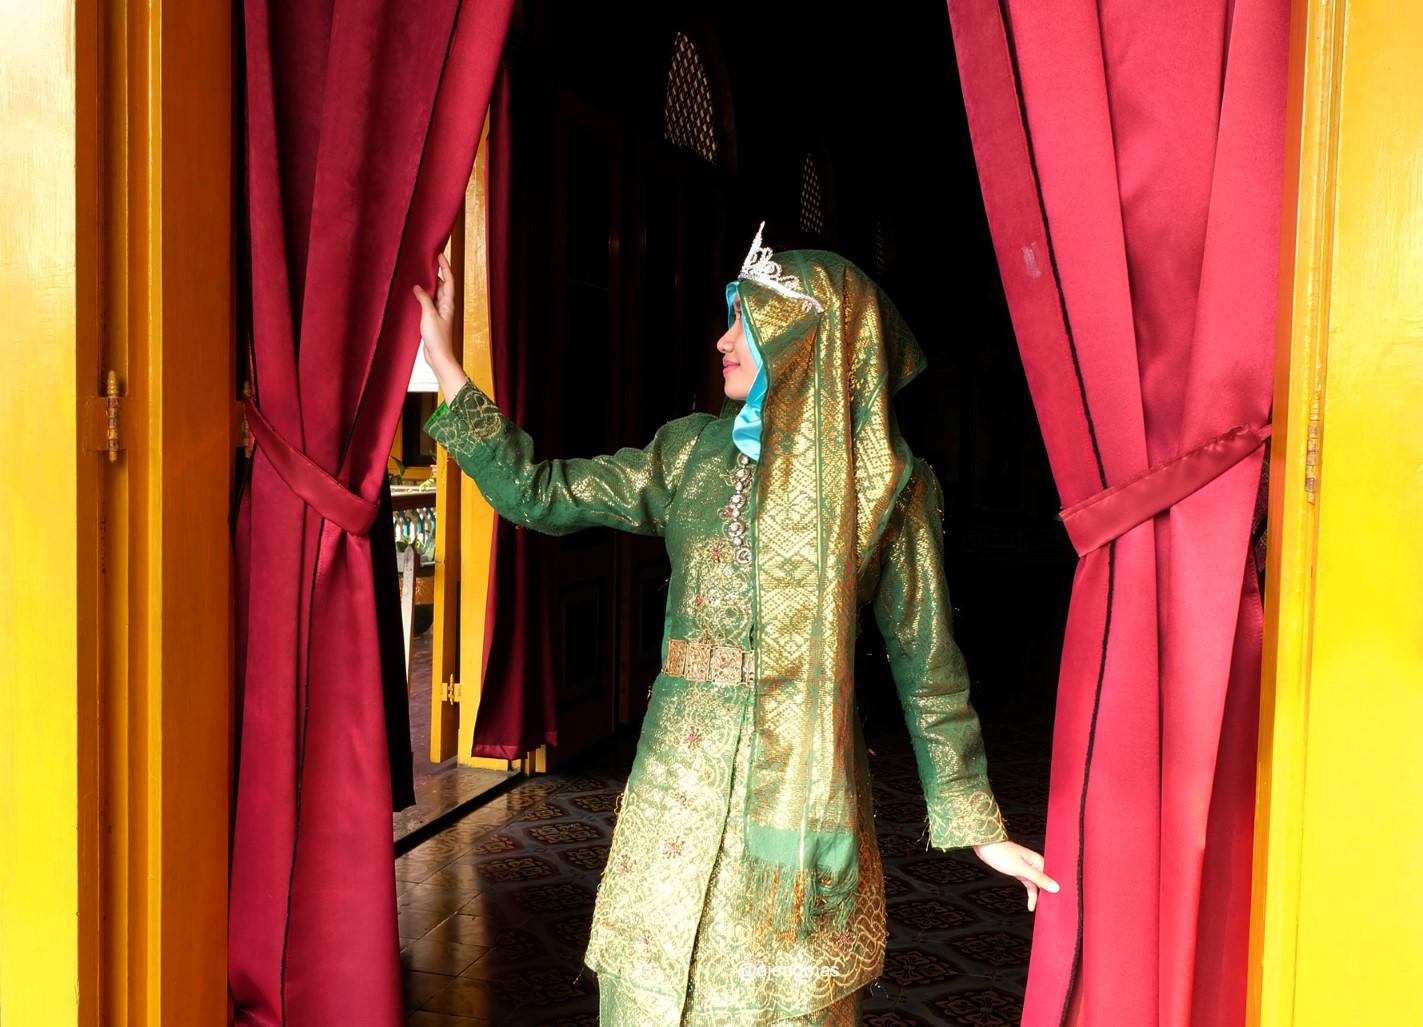 istana-maimun-legenda-putri-hijau-meriam-puntung-pecah